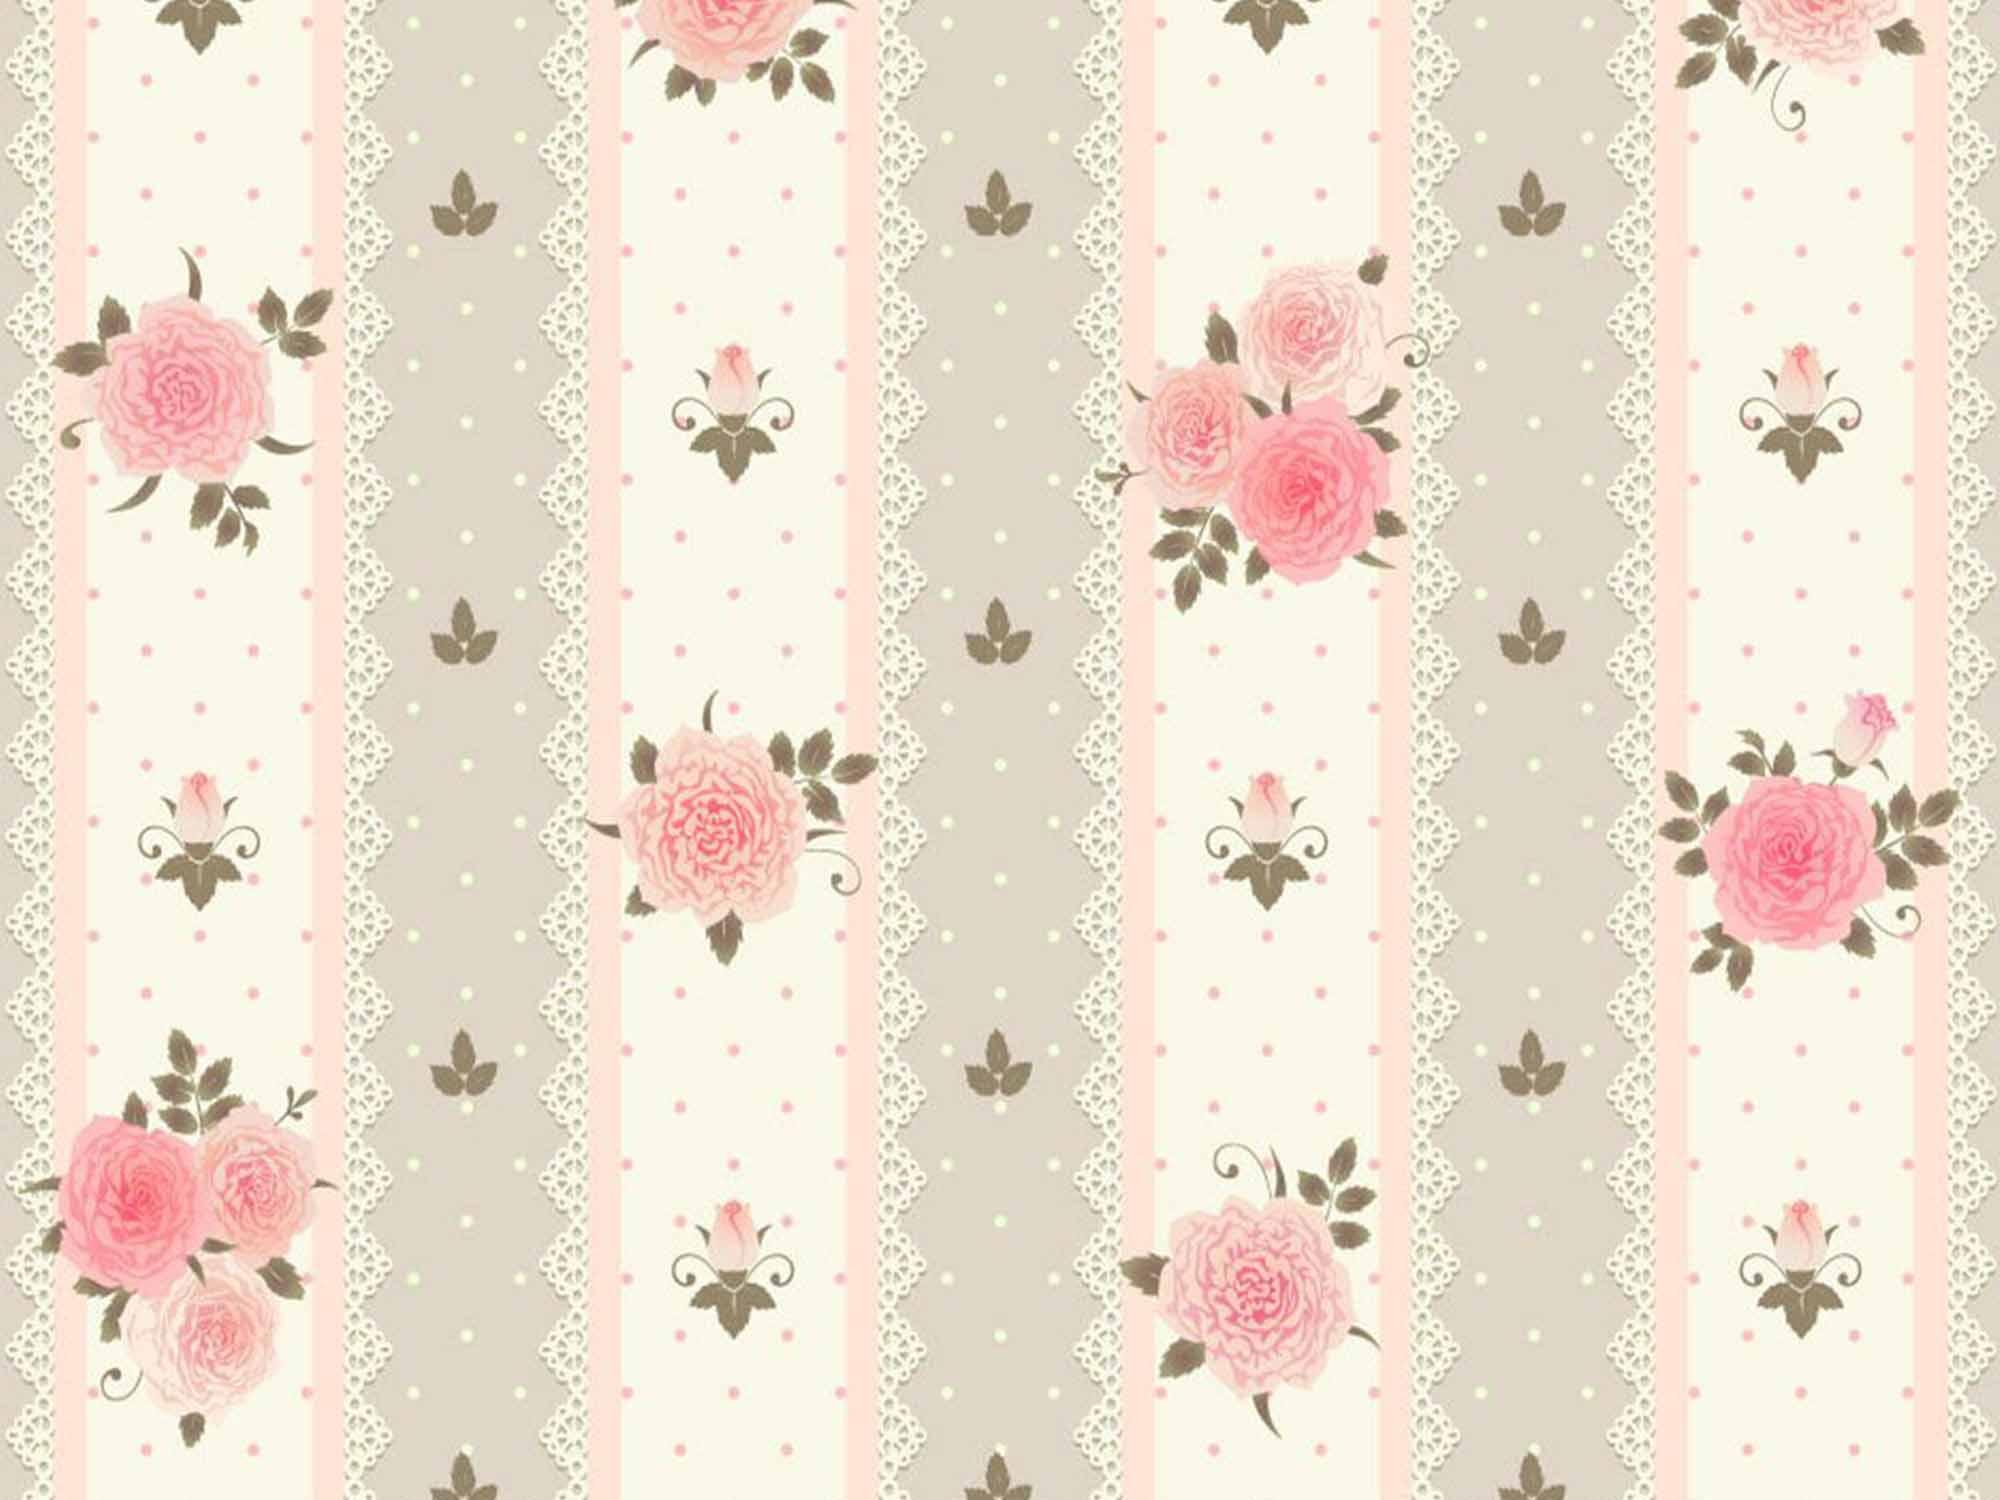 Papel de Parede Floral 0002 - Adesivos de Parede  - Paredes Decoradas